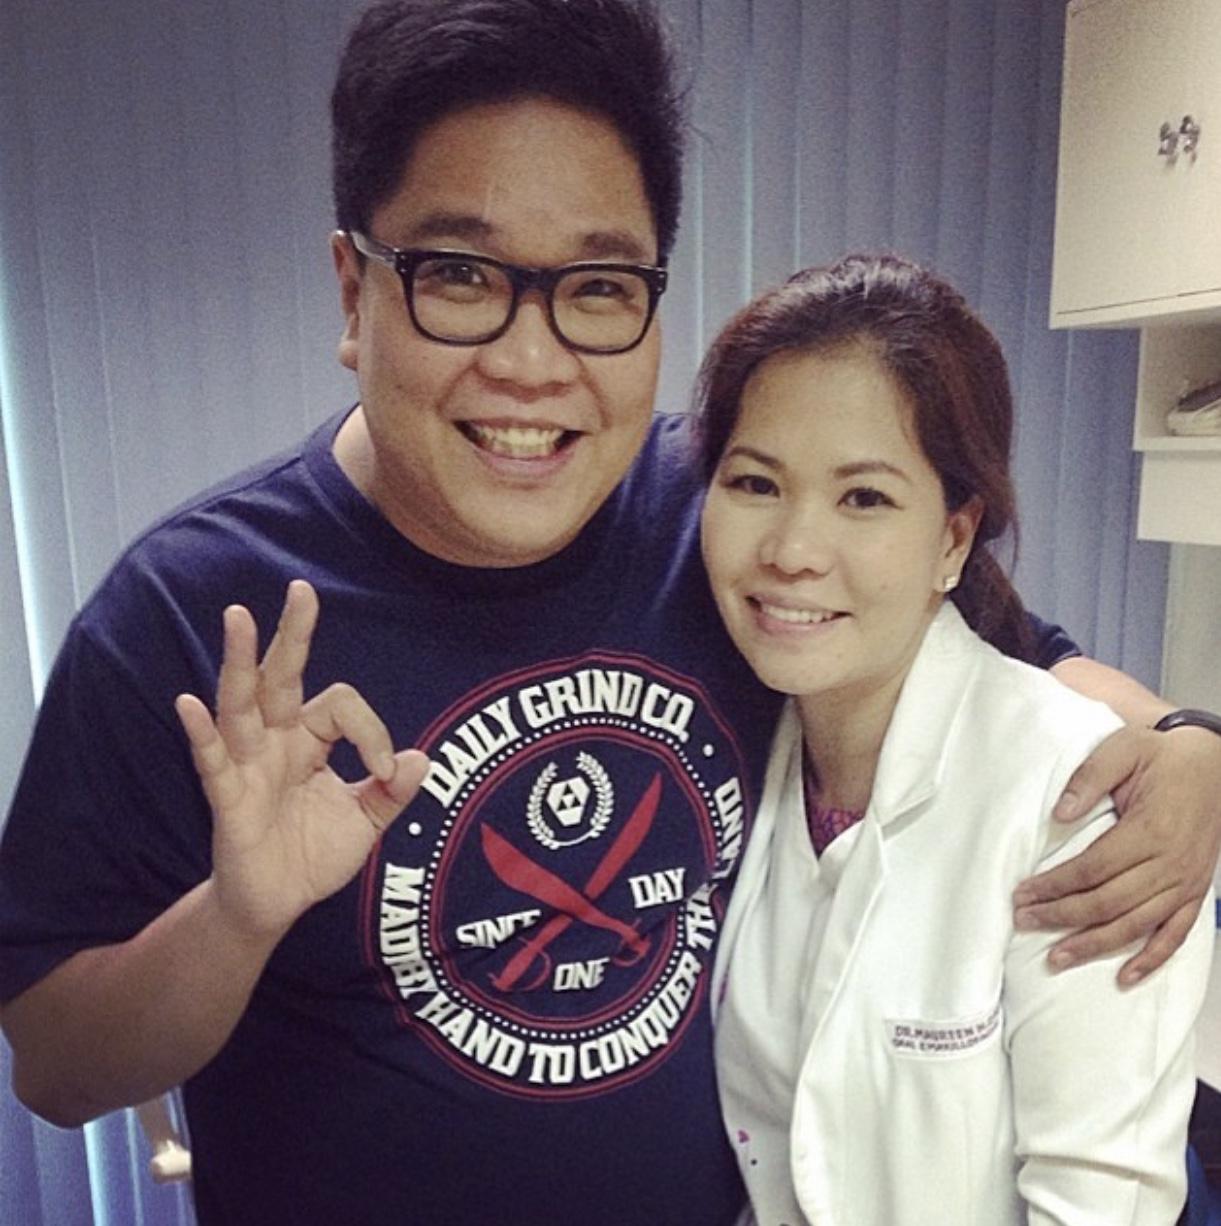 Jugs Jugueta of Itxhyworms with Dr. Maureen Nac-Castillo